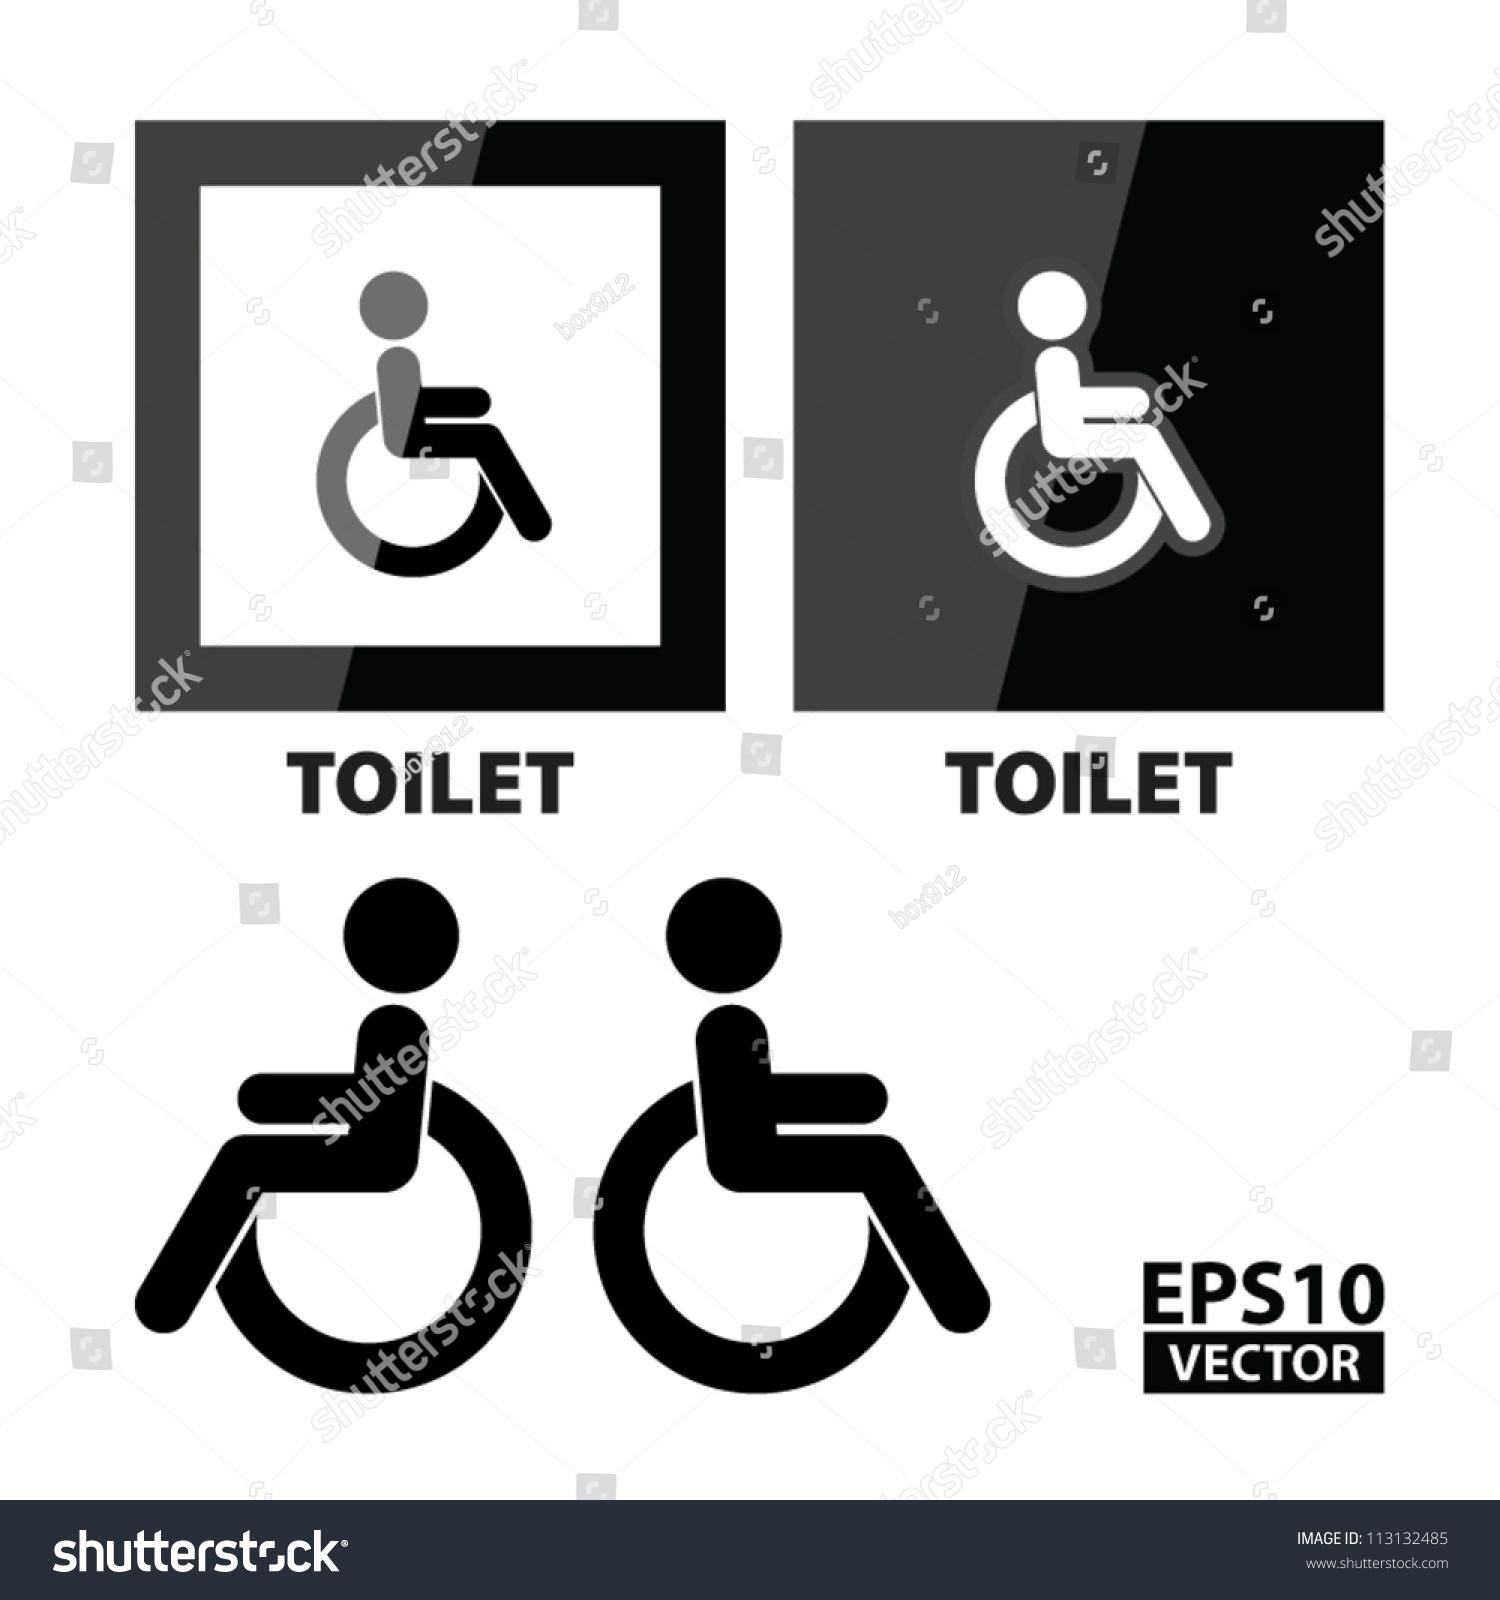 Eps10 Vector Black Square Handicap Toilet Stock 113132485